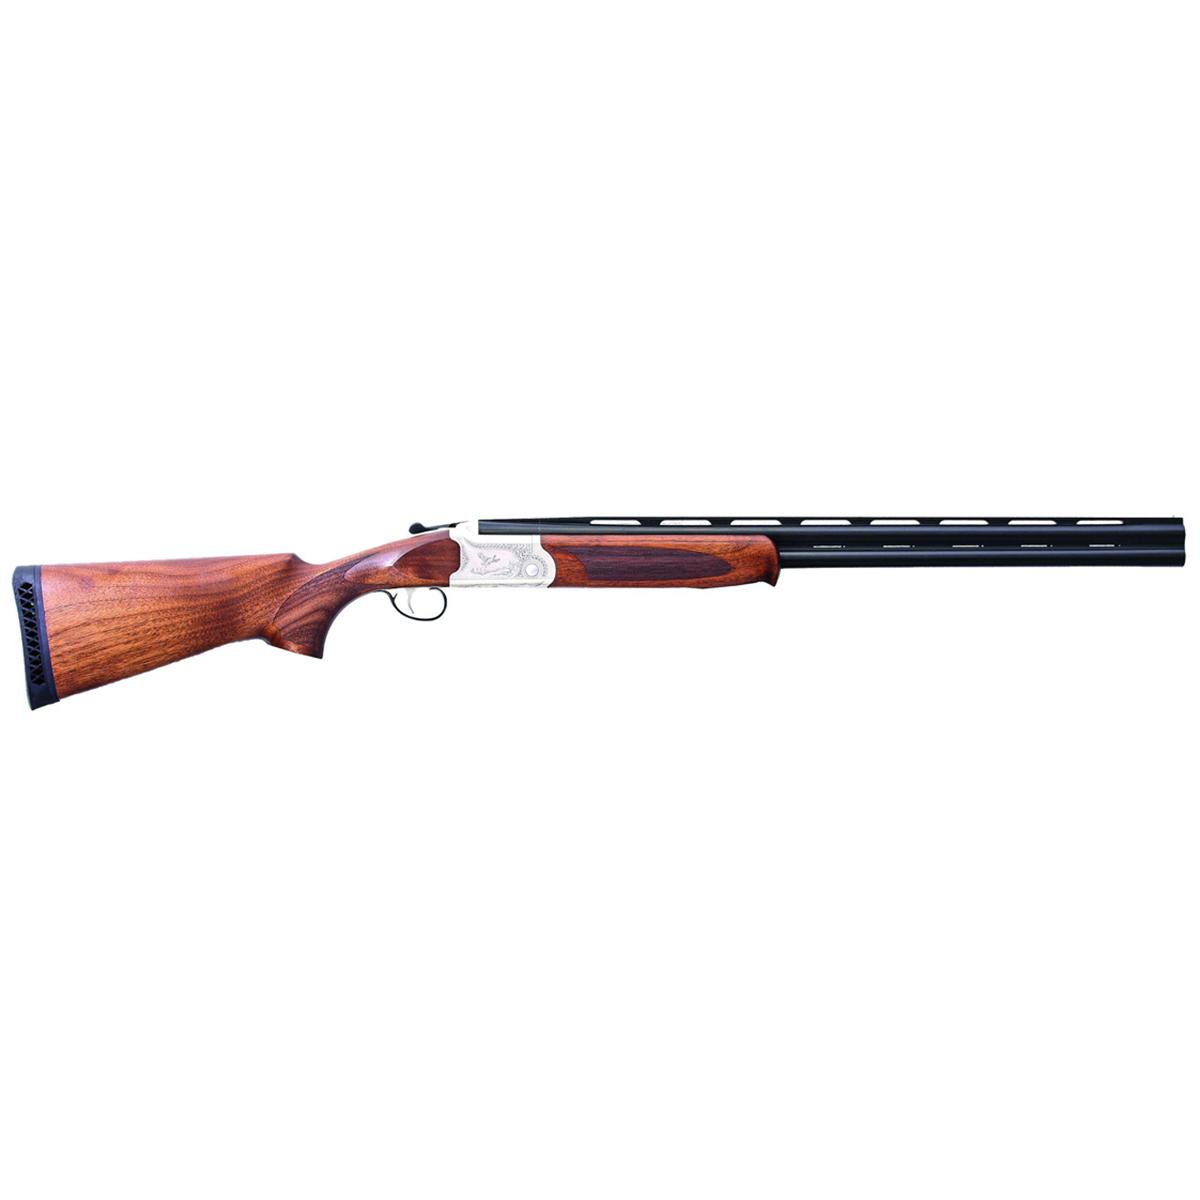 American Tactical Imports Cavalry SVE Shotgun, 12 Ga. thumbnail